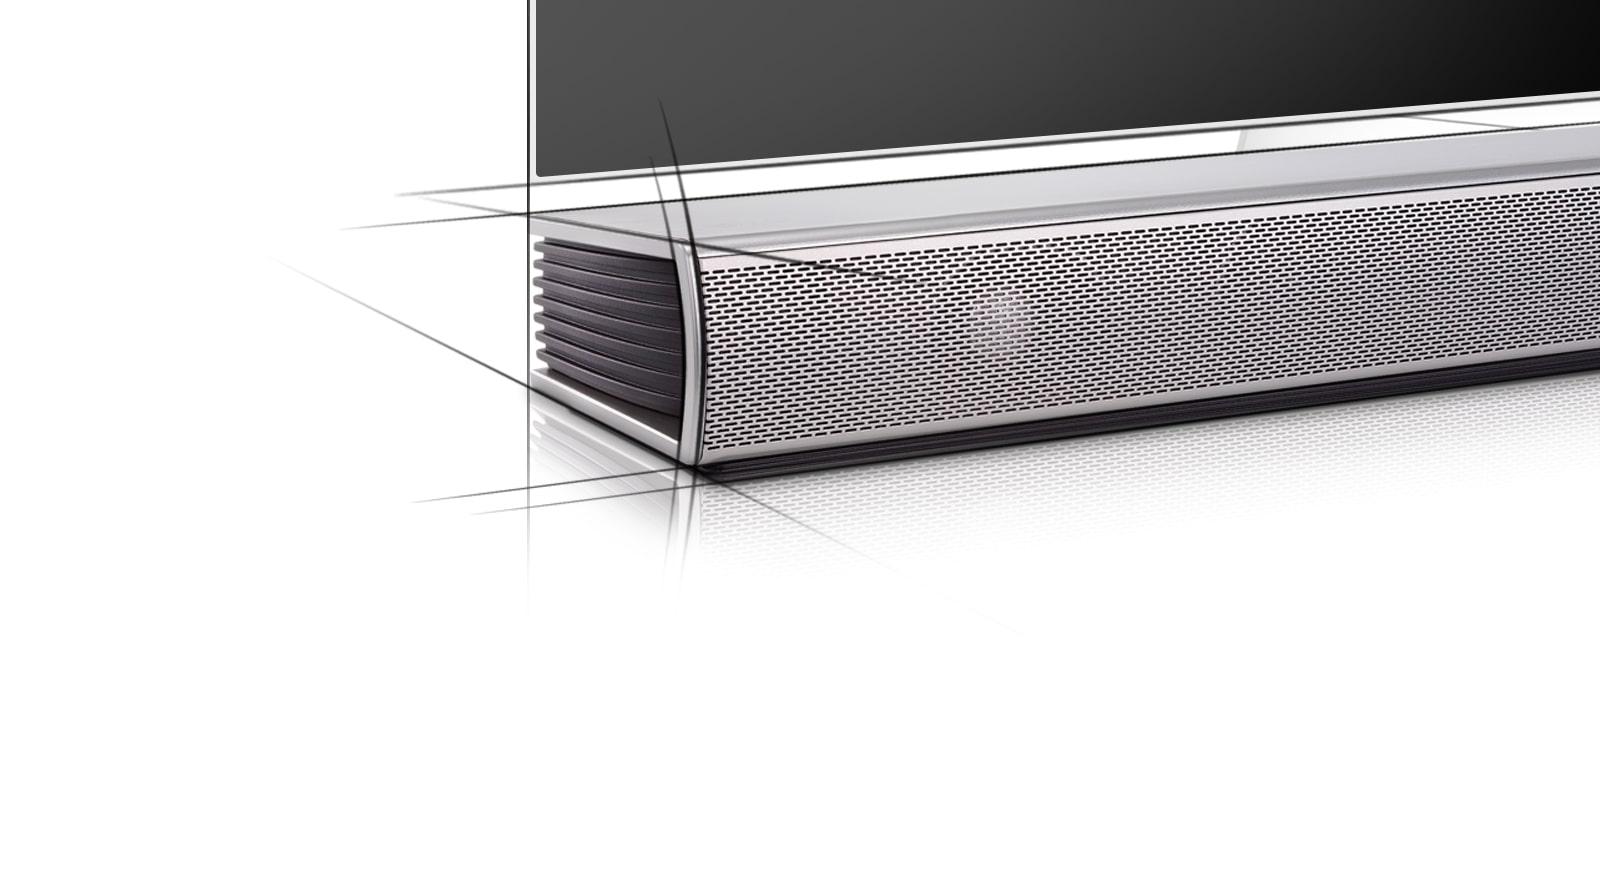 TV Matching Design